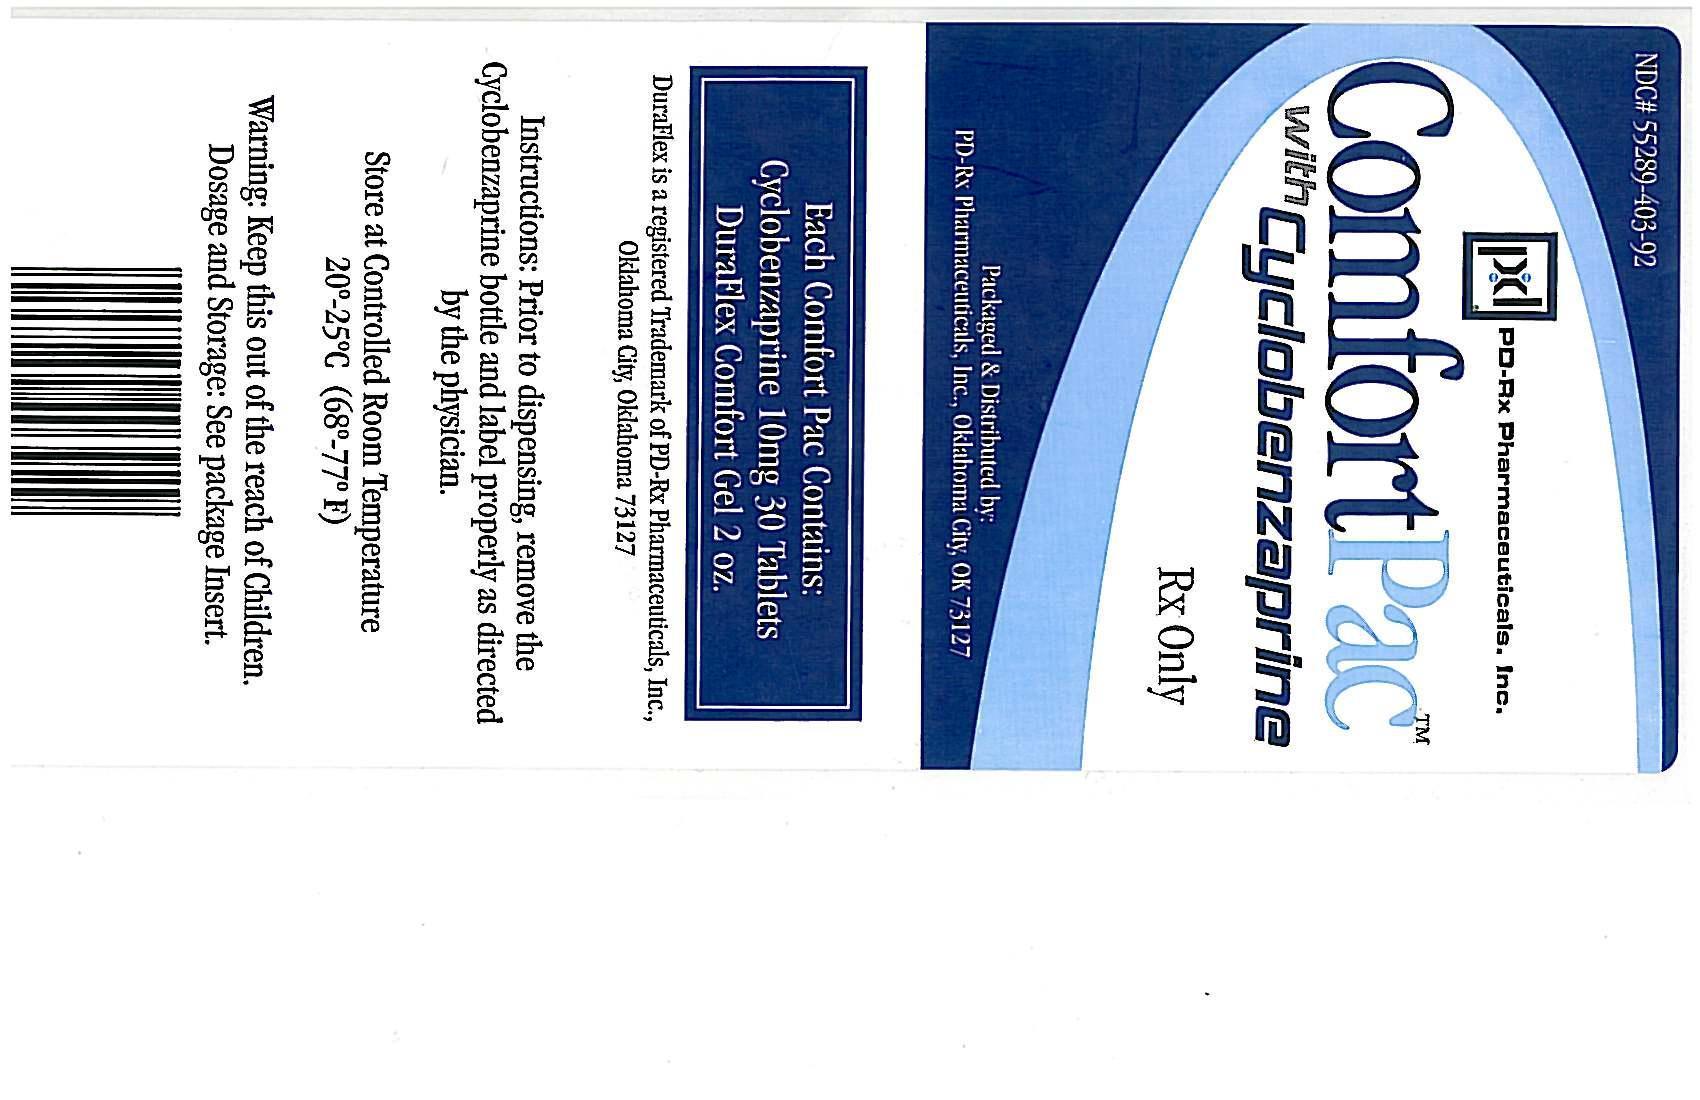 Comfort Pac With Cyclobenzaprine   Cyclobenzaprine Hydrochloride Kit Breastfeeding